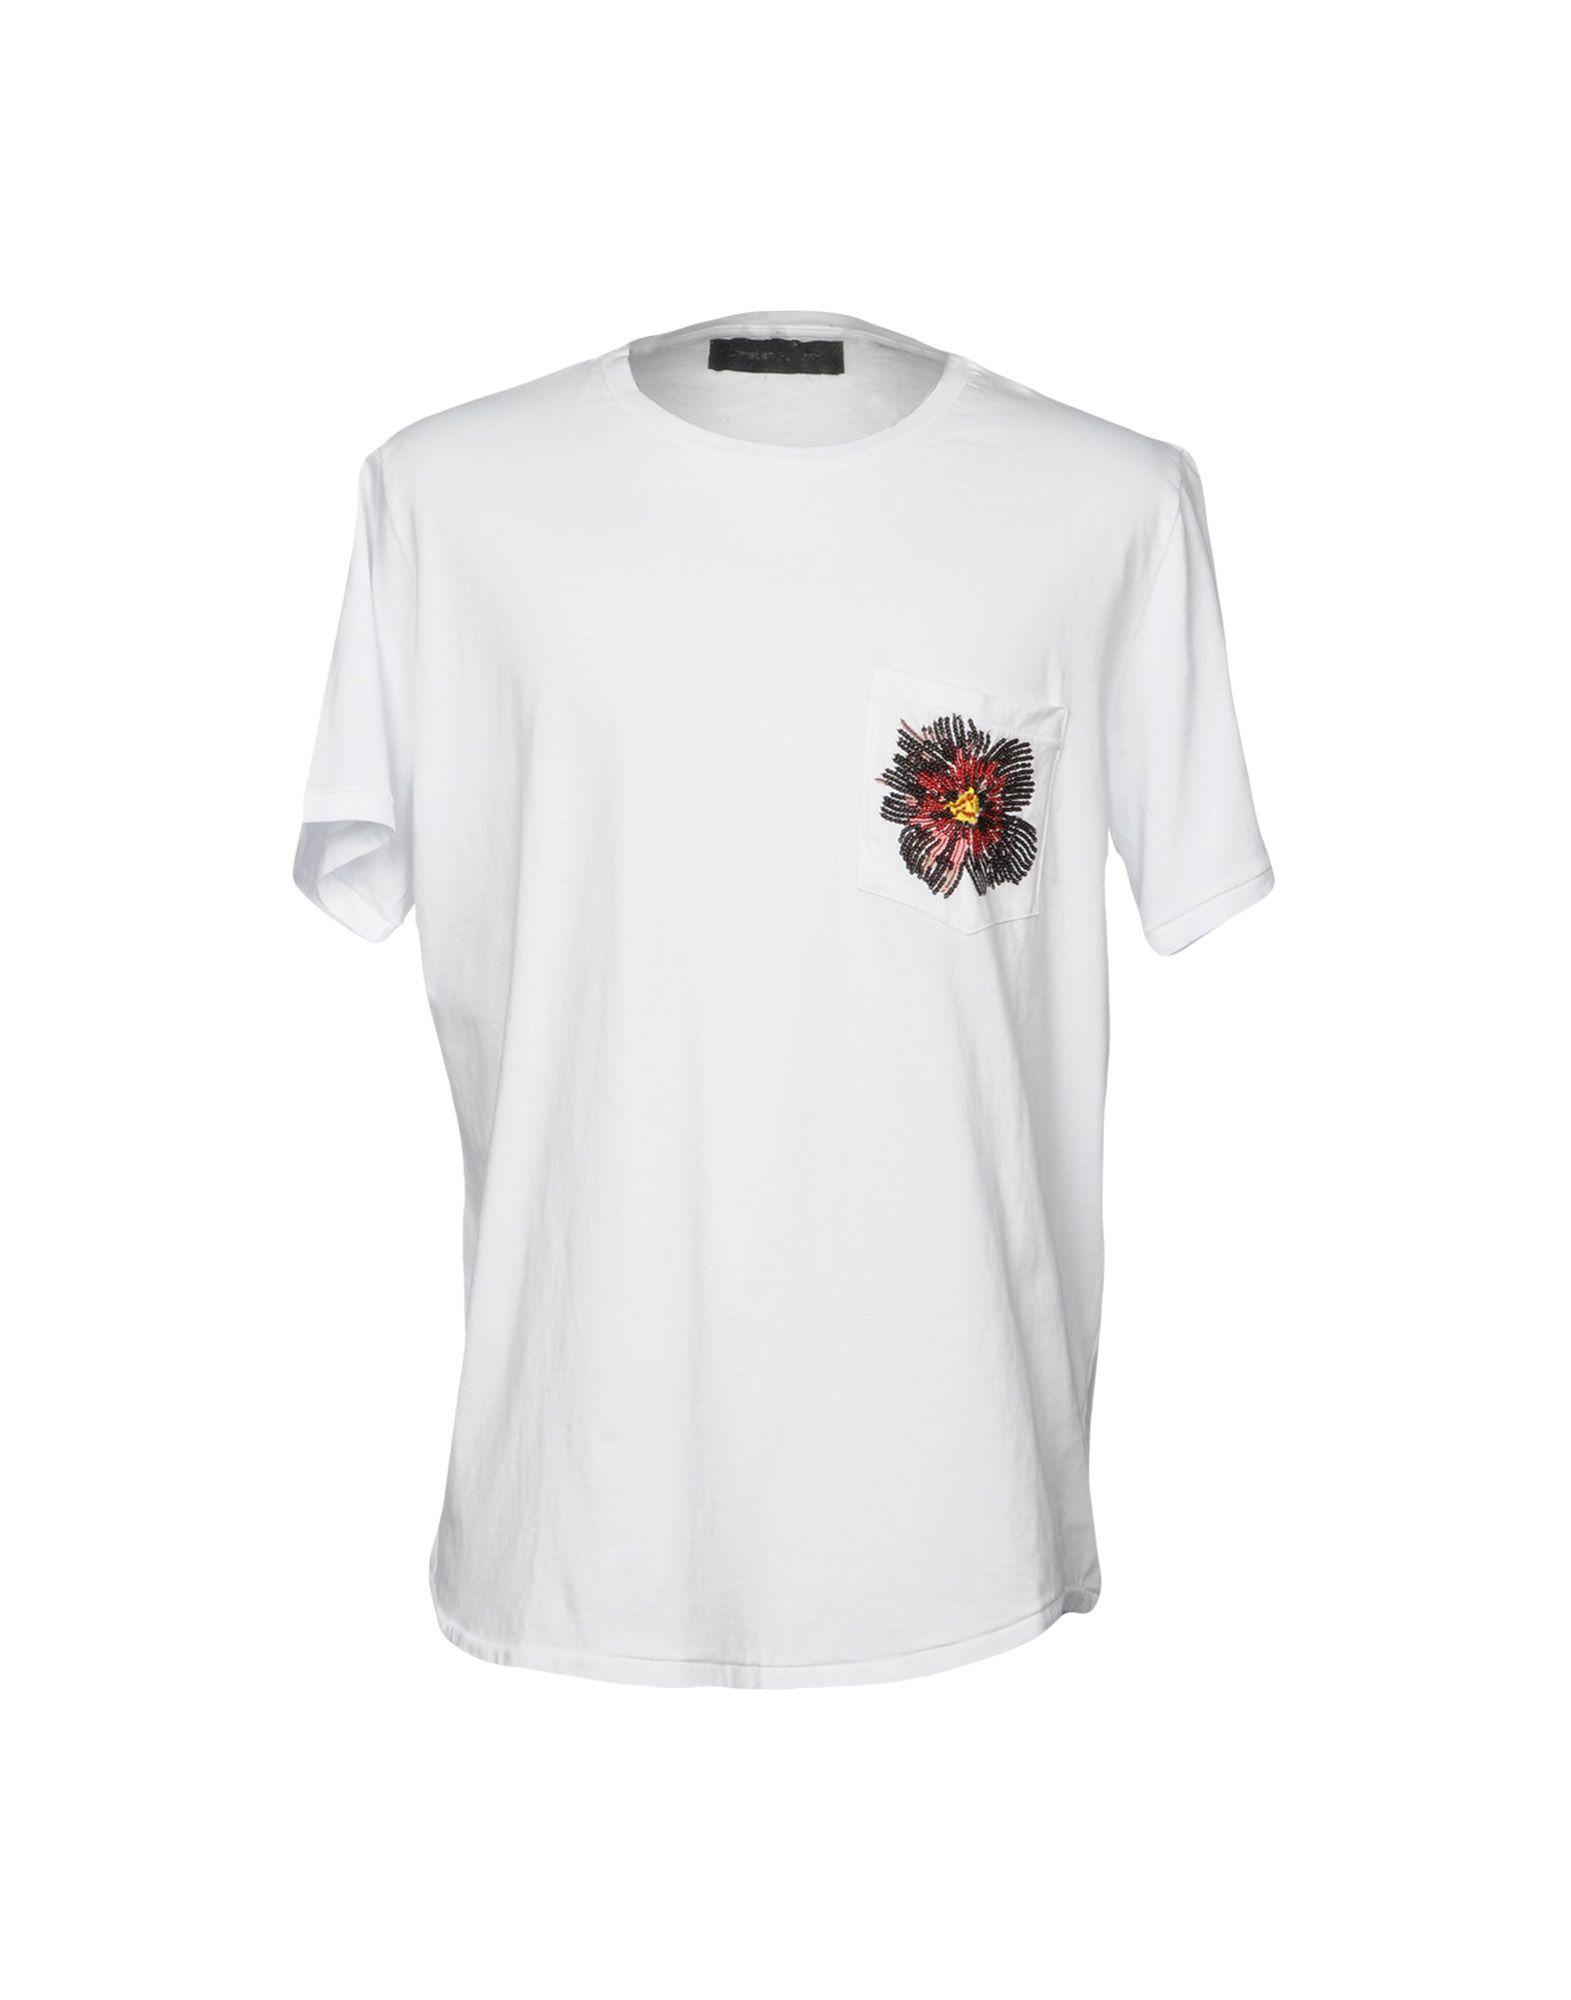 CHRISTIAN PELLIZZARI Футболка футболка christian audigier экзотическая птица